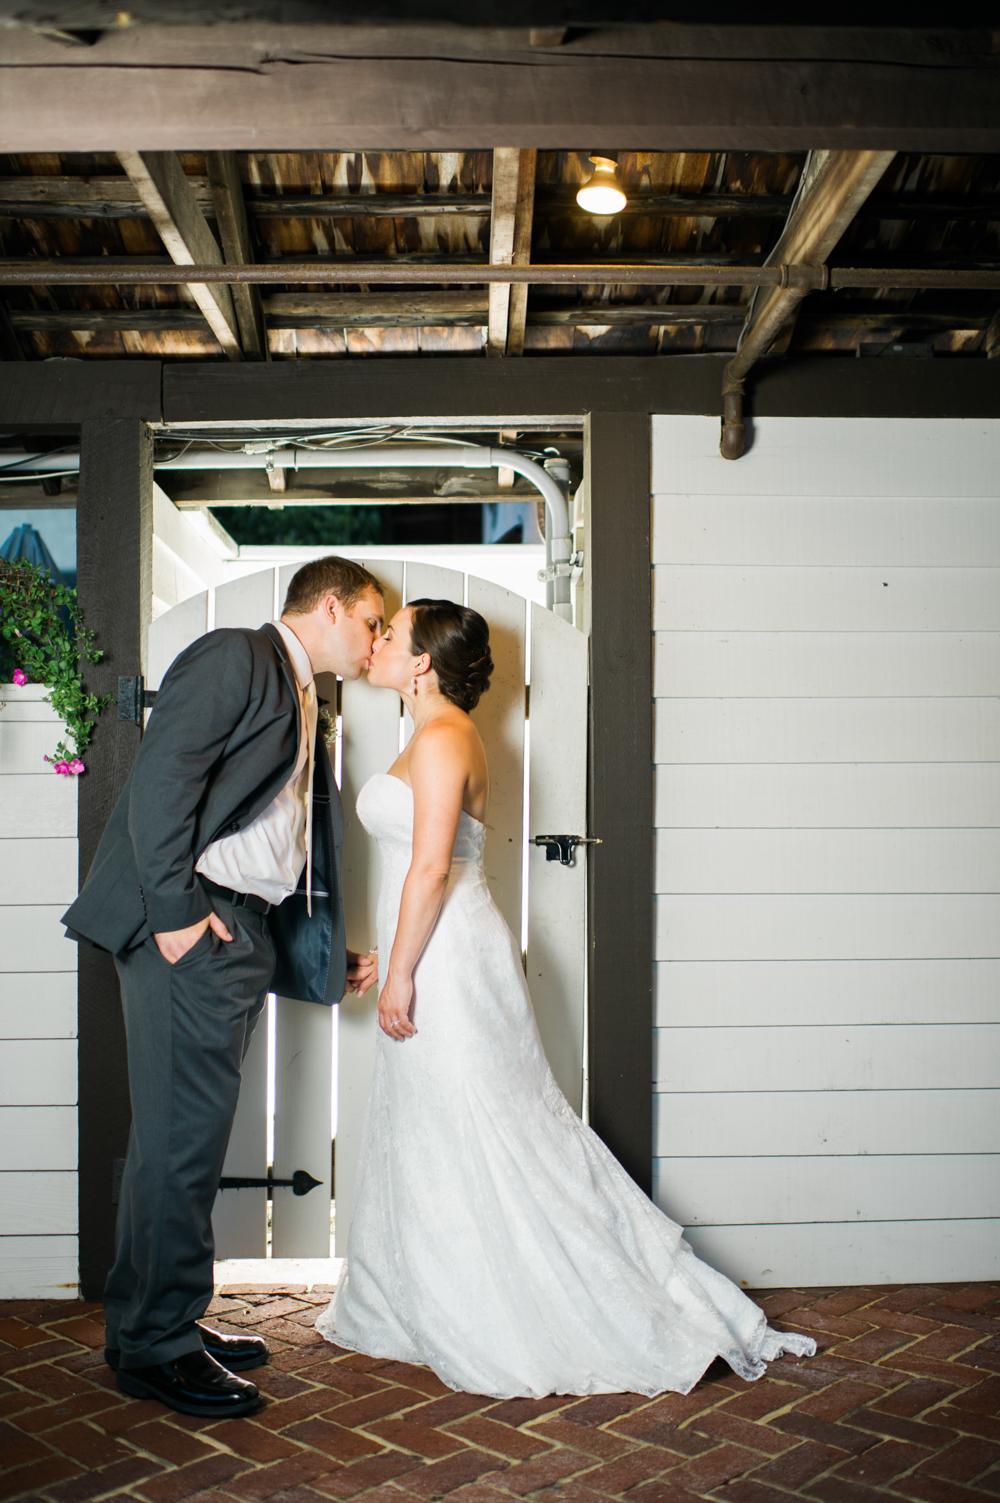 Mendenhall_Inn_Wedding_Pennsylvania_Rebecca_Watkins_Photography_2014-073.jpg